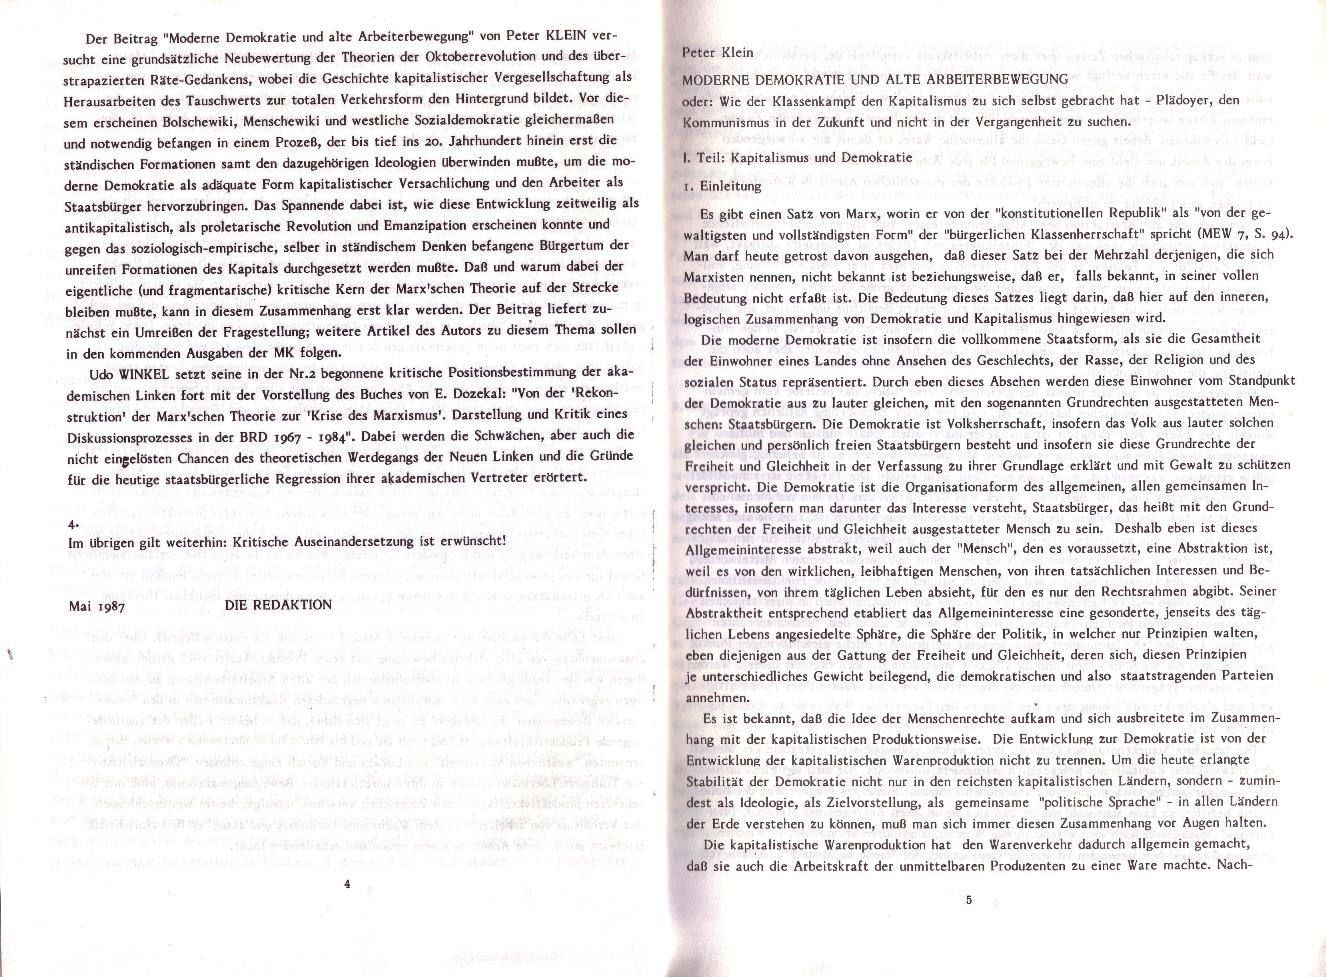 Erlangen_VMK_MK_1987_03_004